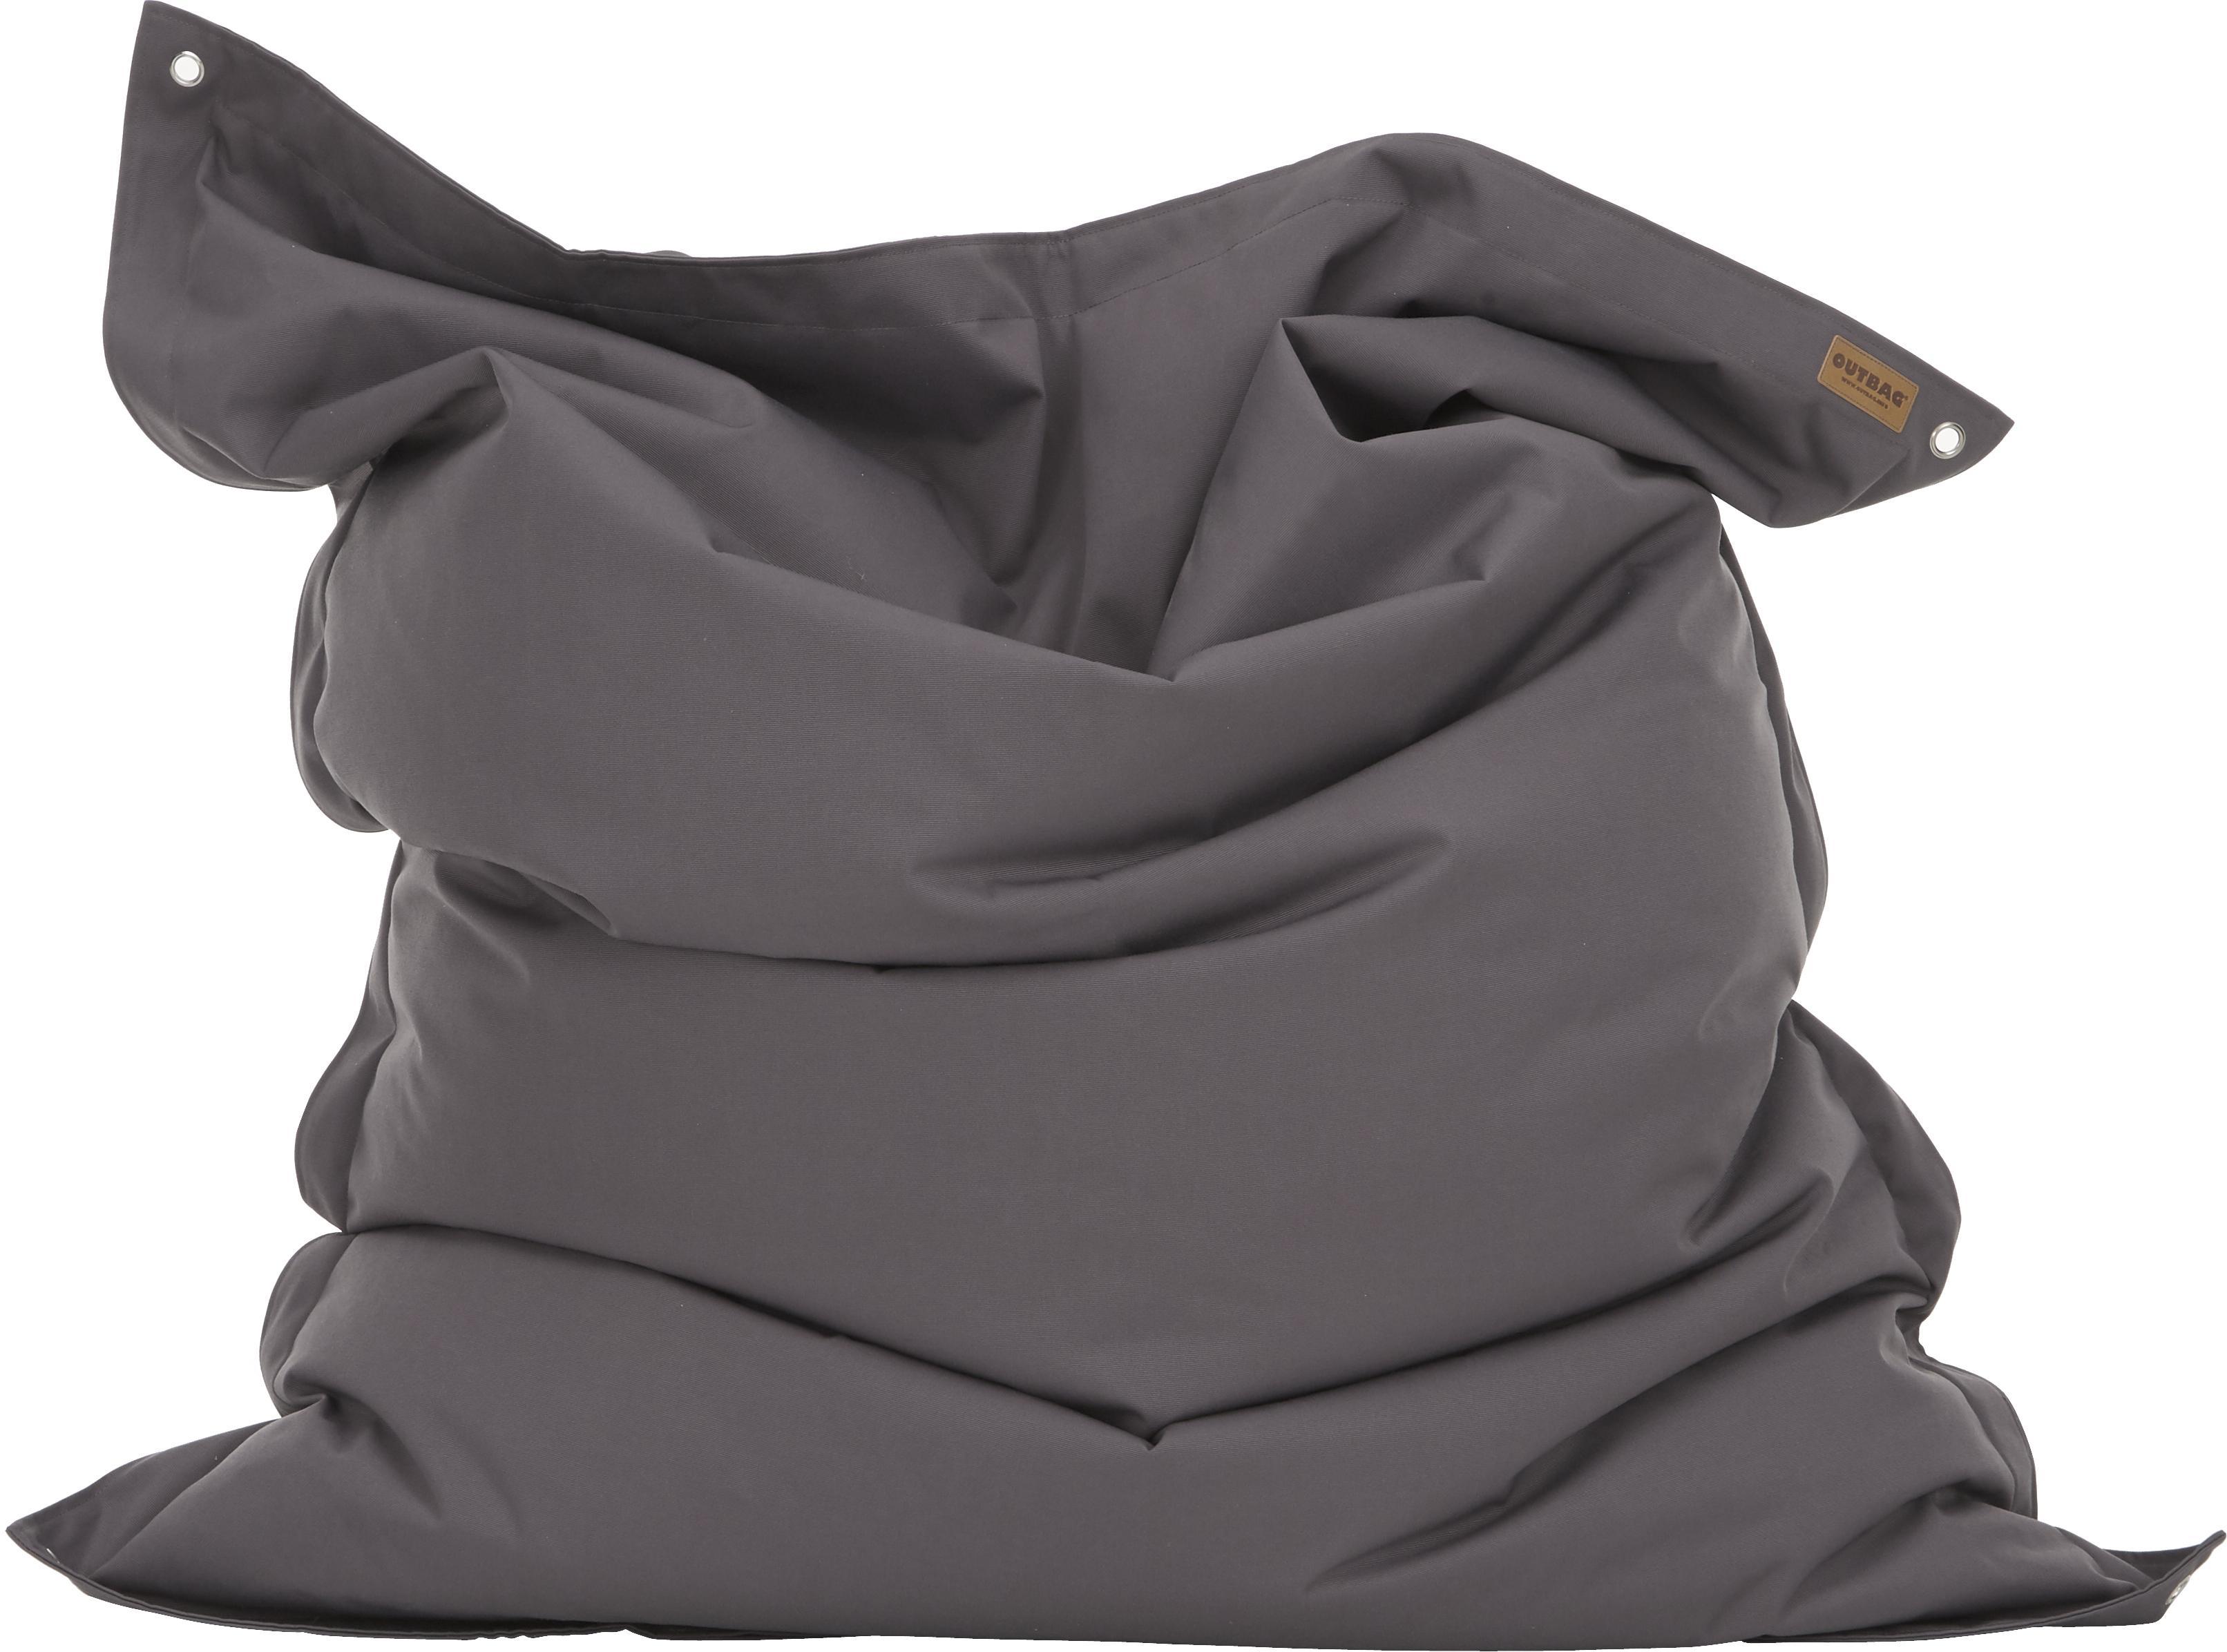 Grosser Sitzsack Meadow, Bezug: Polyester, polyurethanbes, Anthrazit, 130 x 160 cm